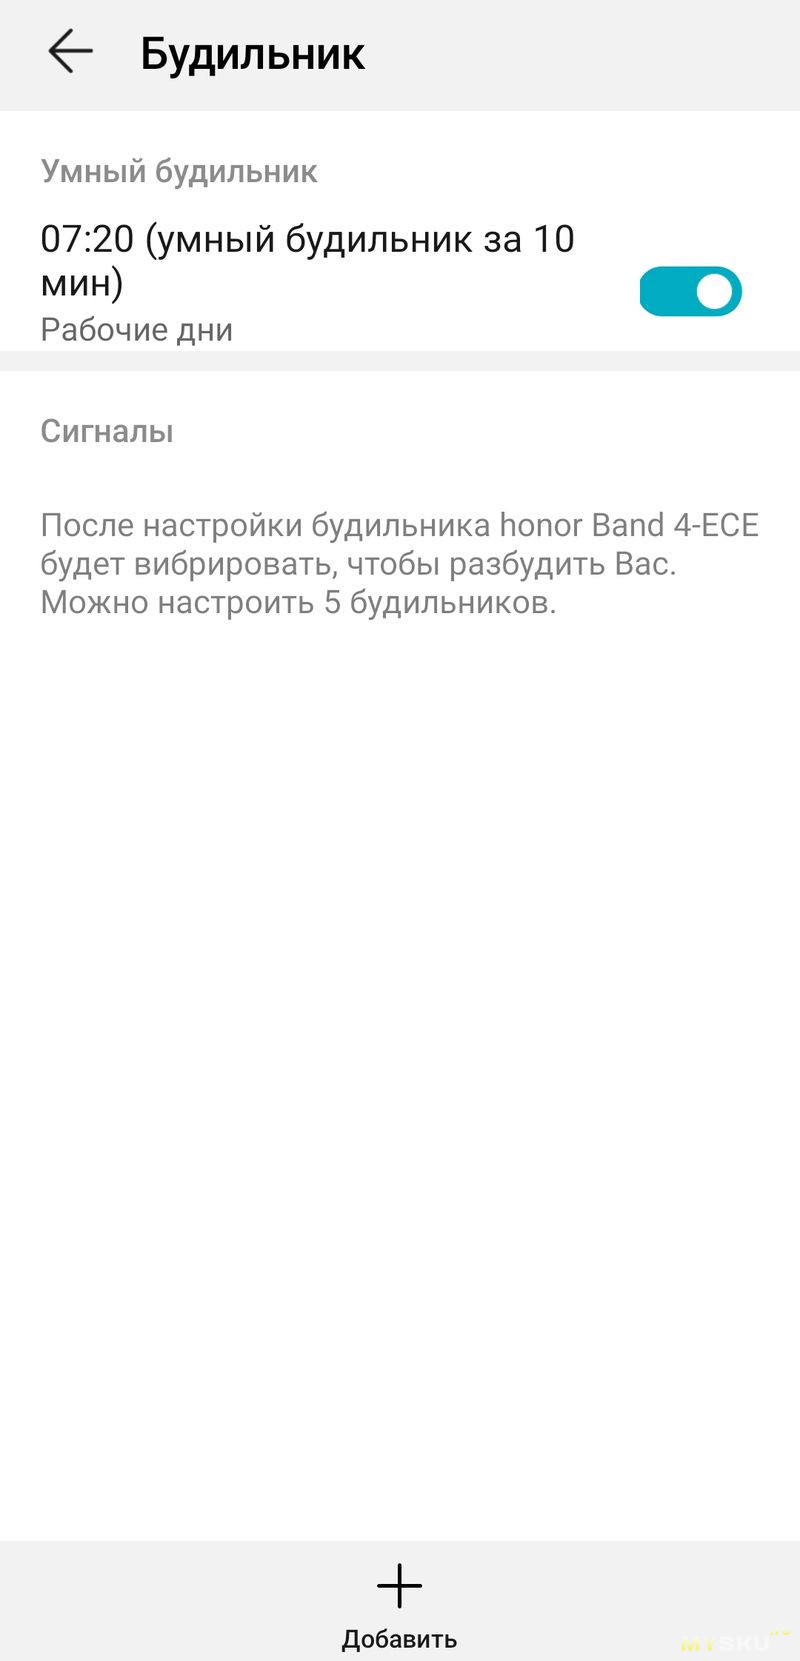 Фитнес-браслет Honor Band 4-ECE